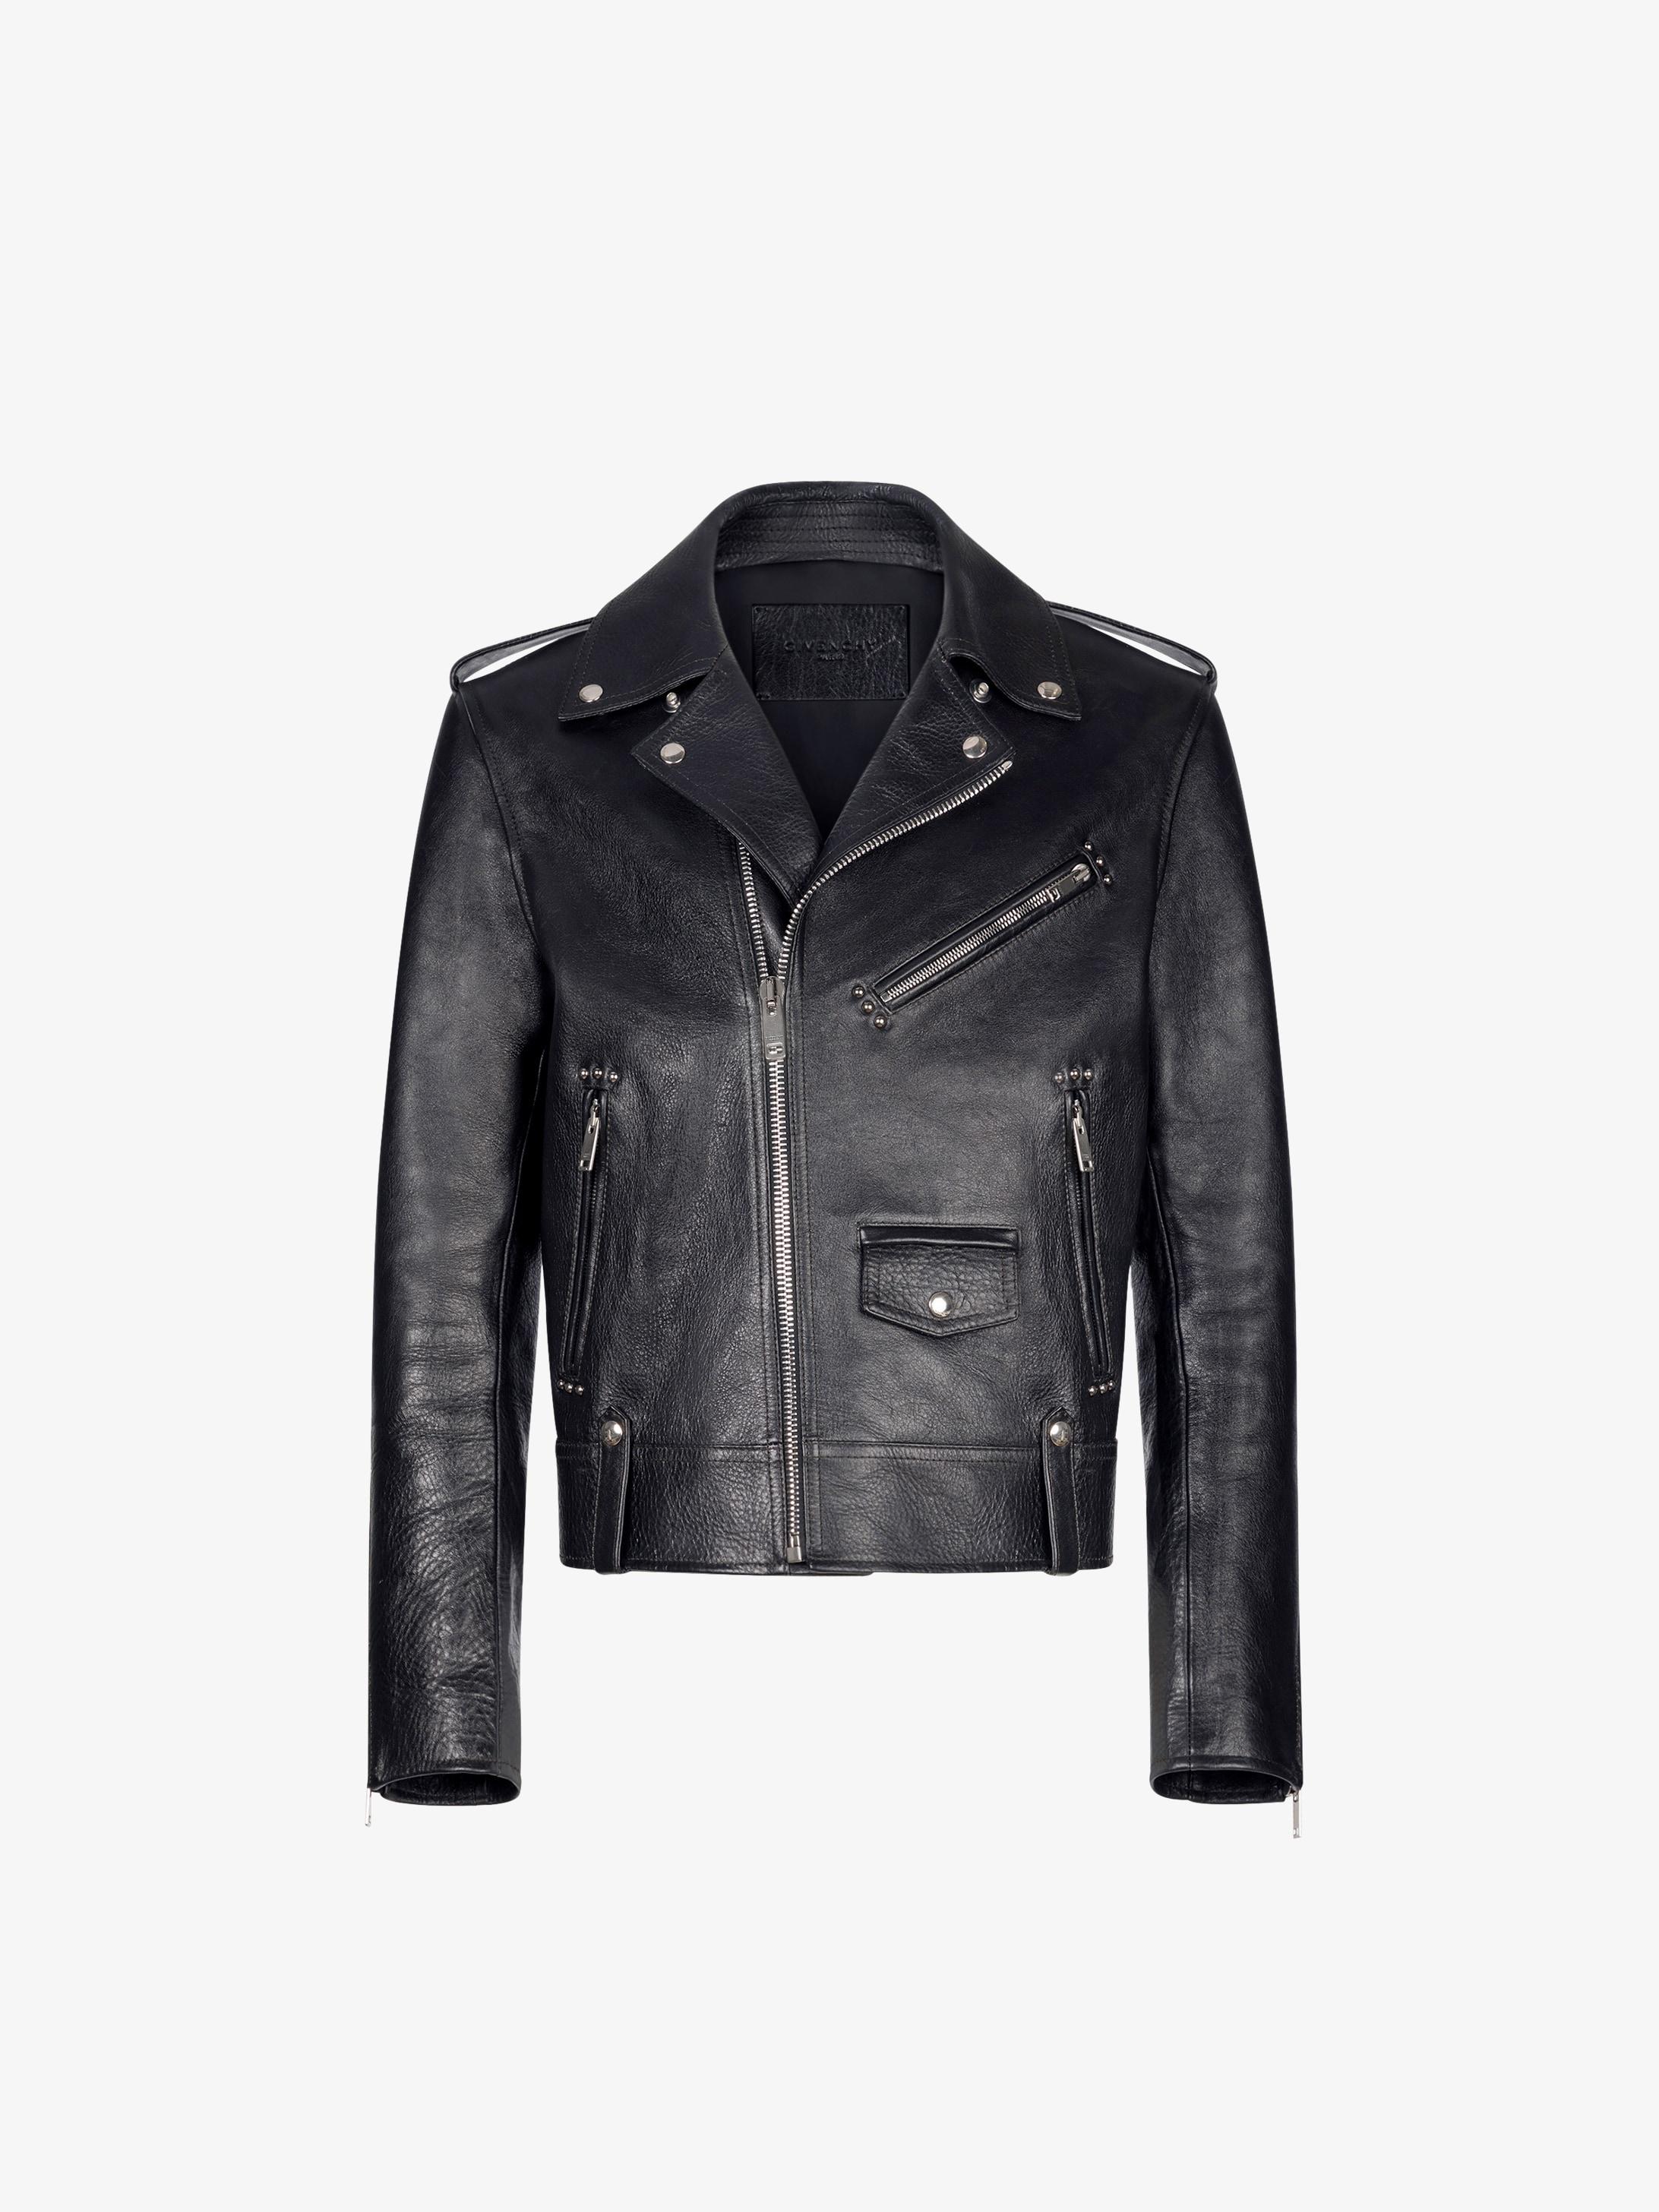 Biker jacket in leather with metallic details